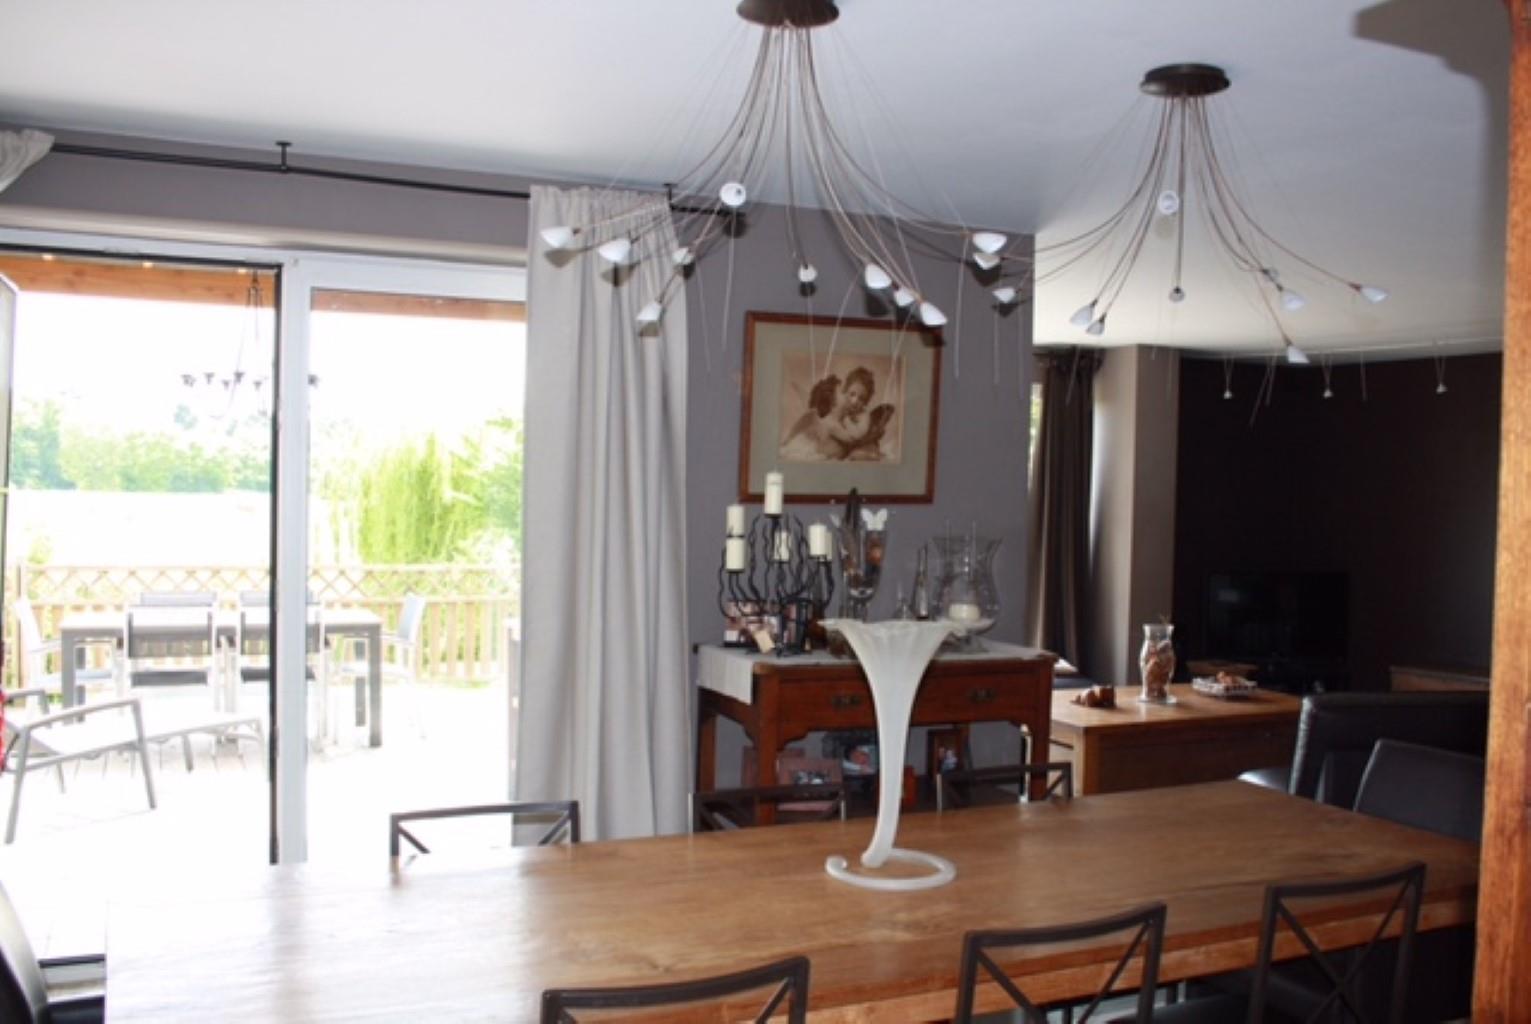 House - Villersla-Ville Tilly - #2038007-9